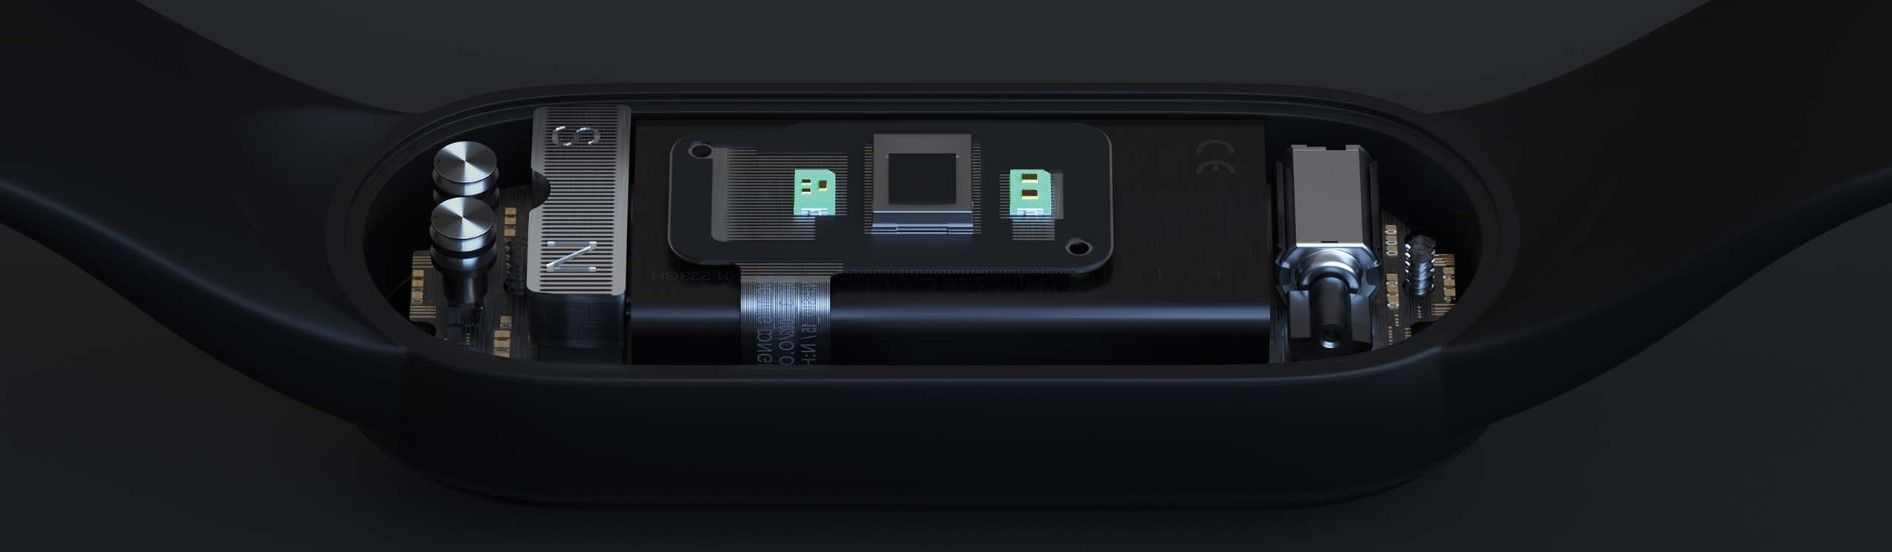 Xiaomi Mi Smart band 5 NFC изнутри